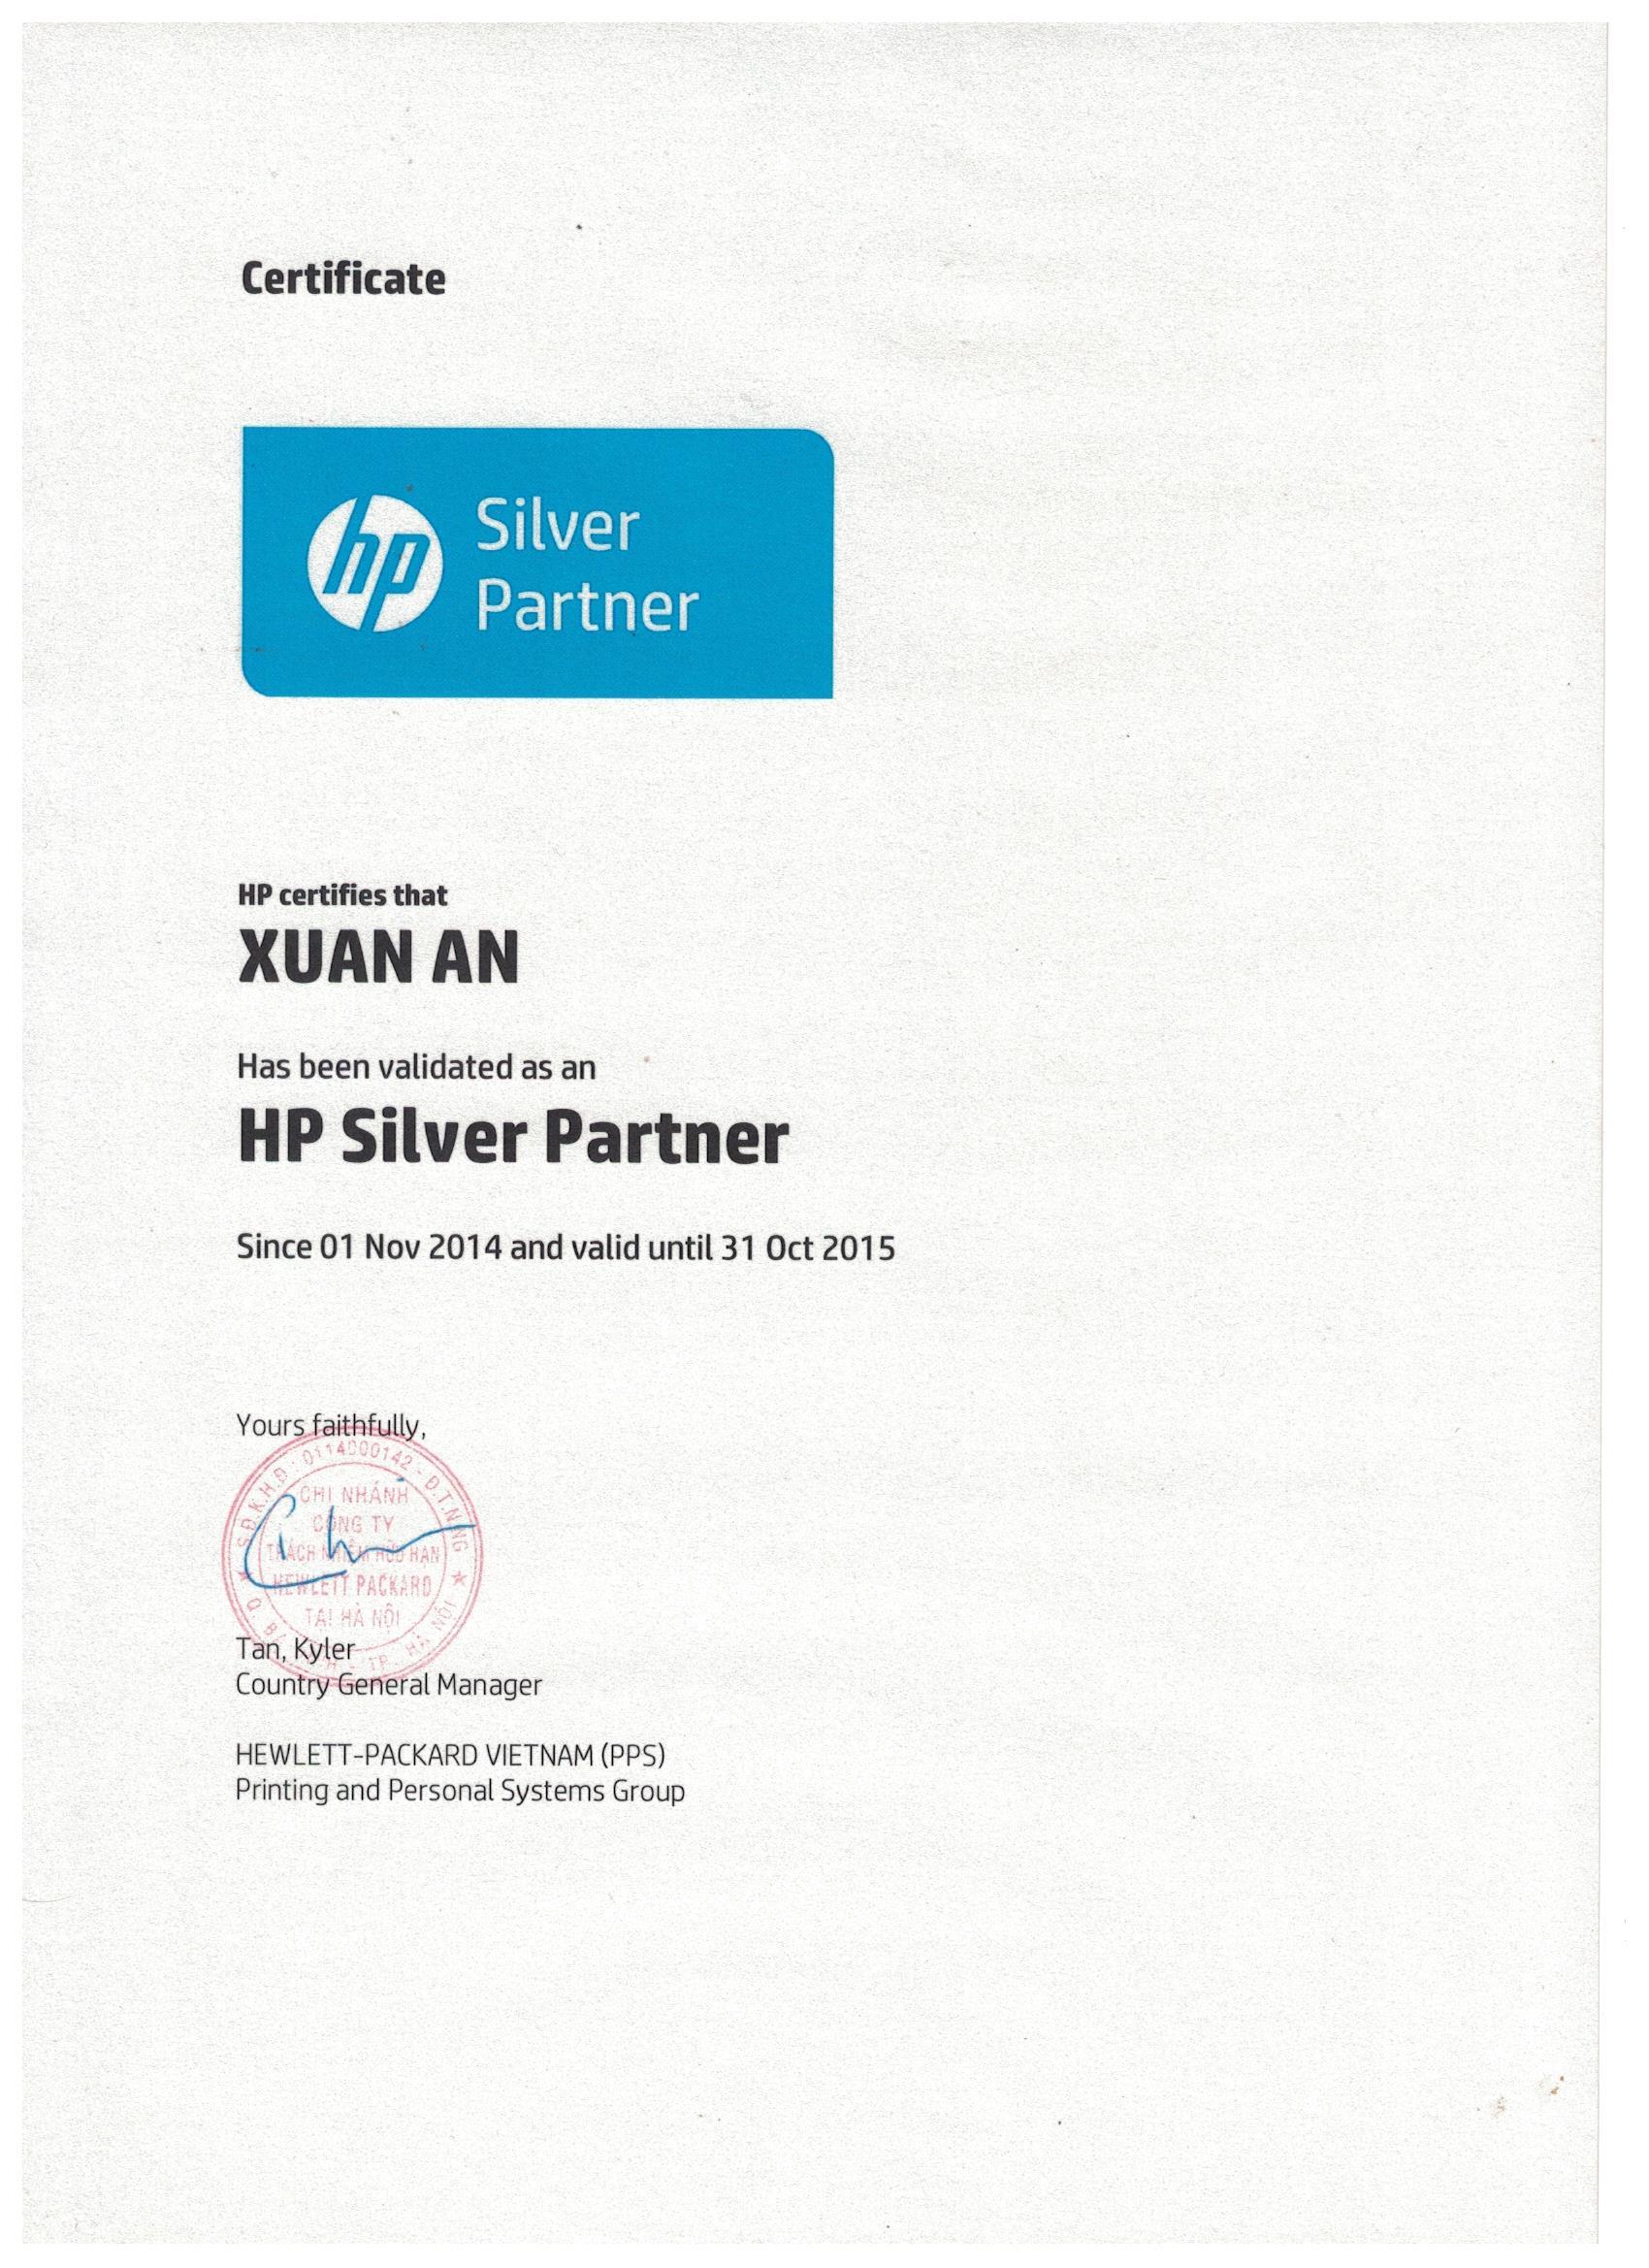 HP Probook 450 G7 - 9LA53PA (Silver)